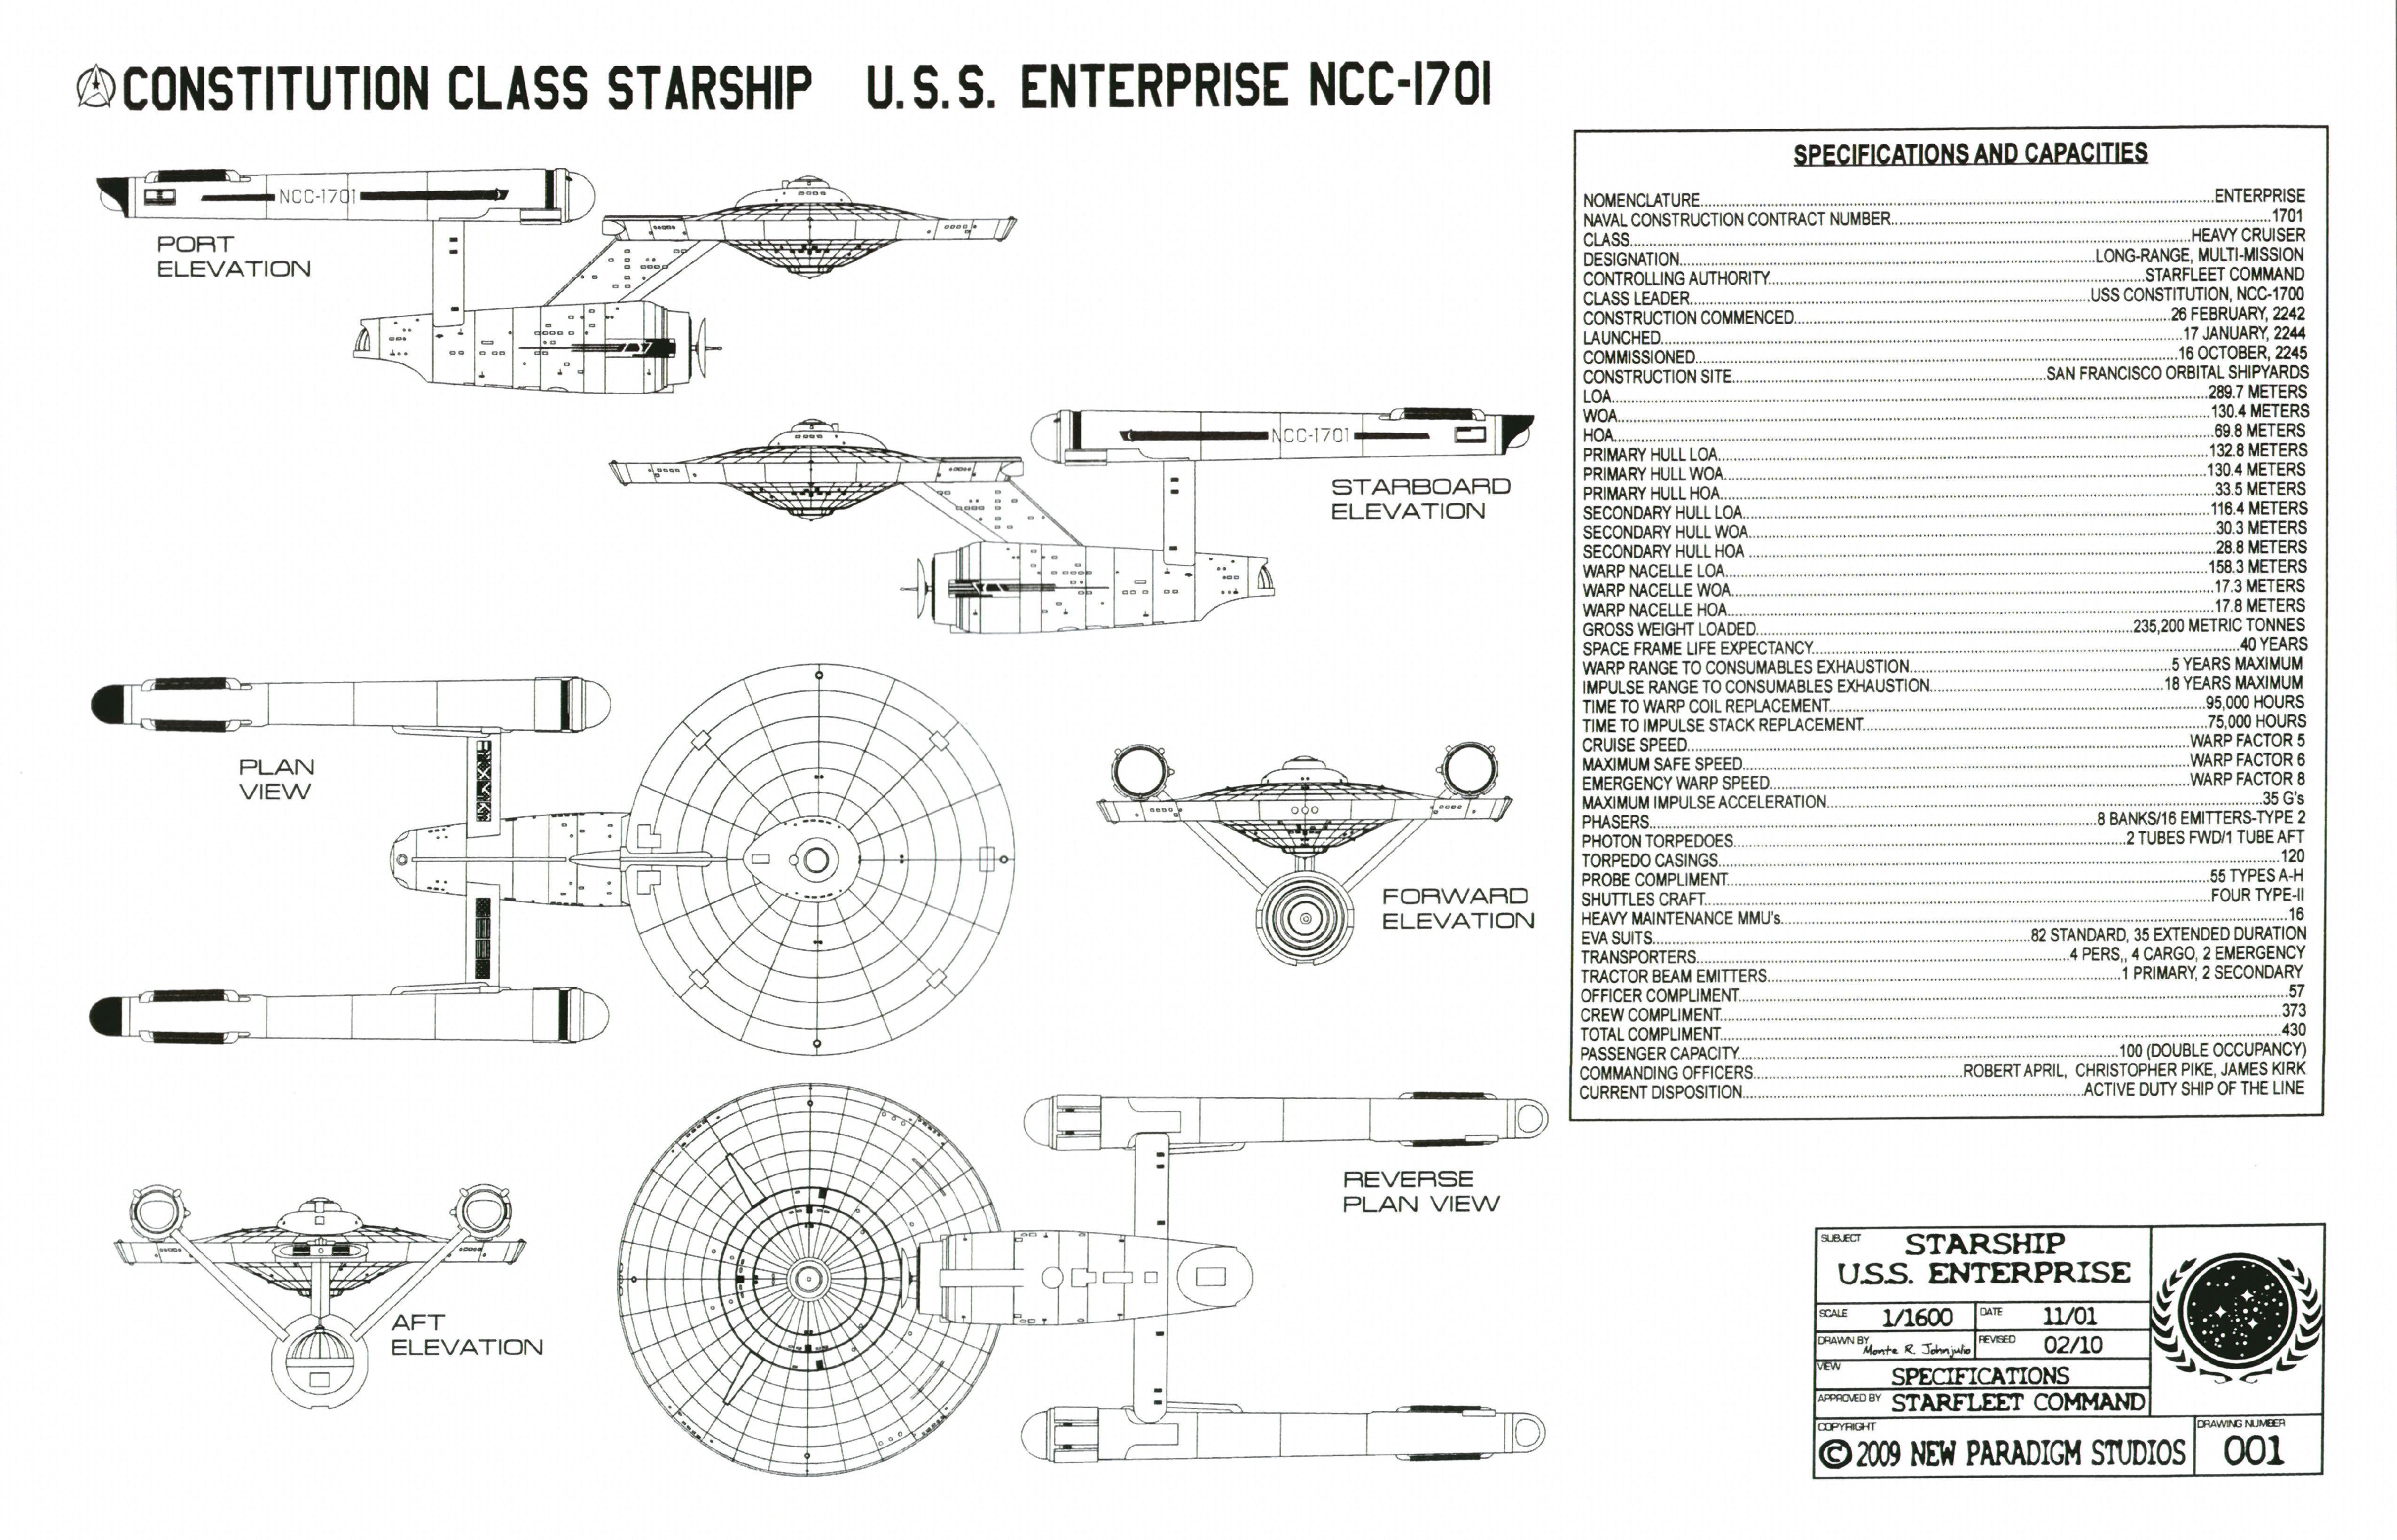 Schematics For Constitution Class Enterprise